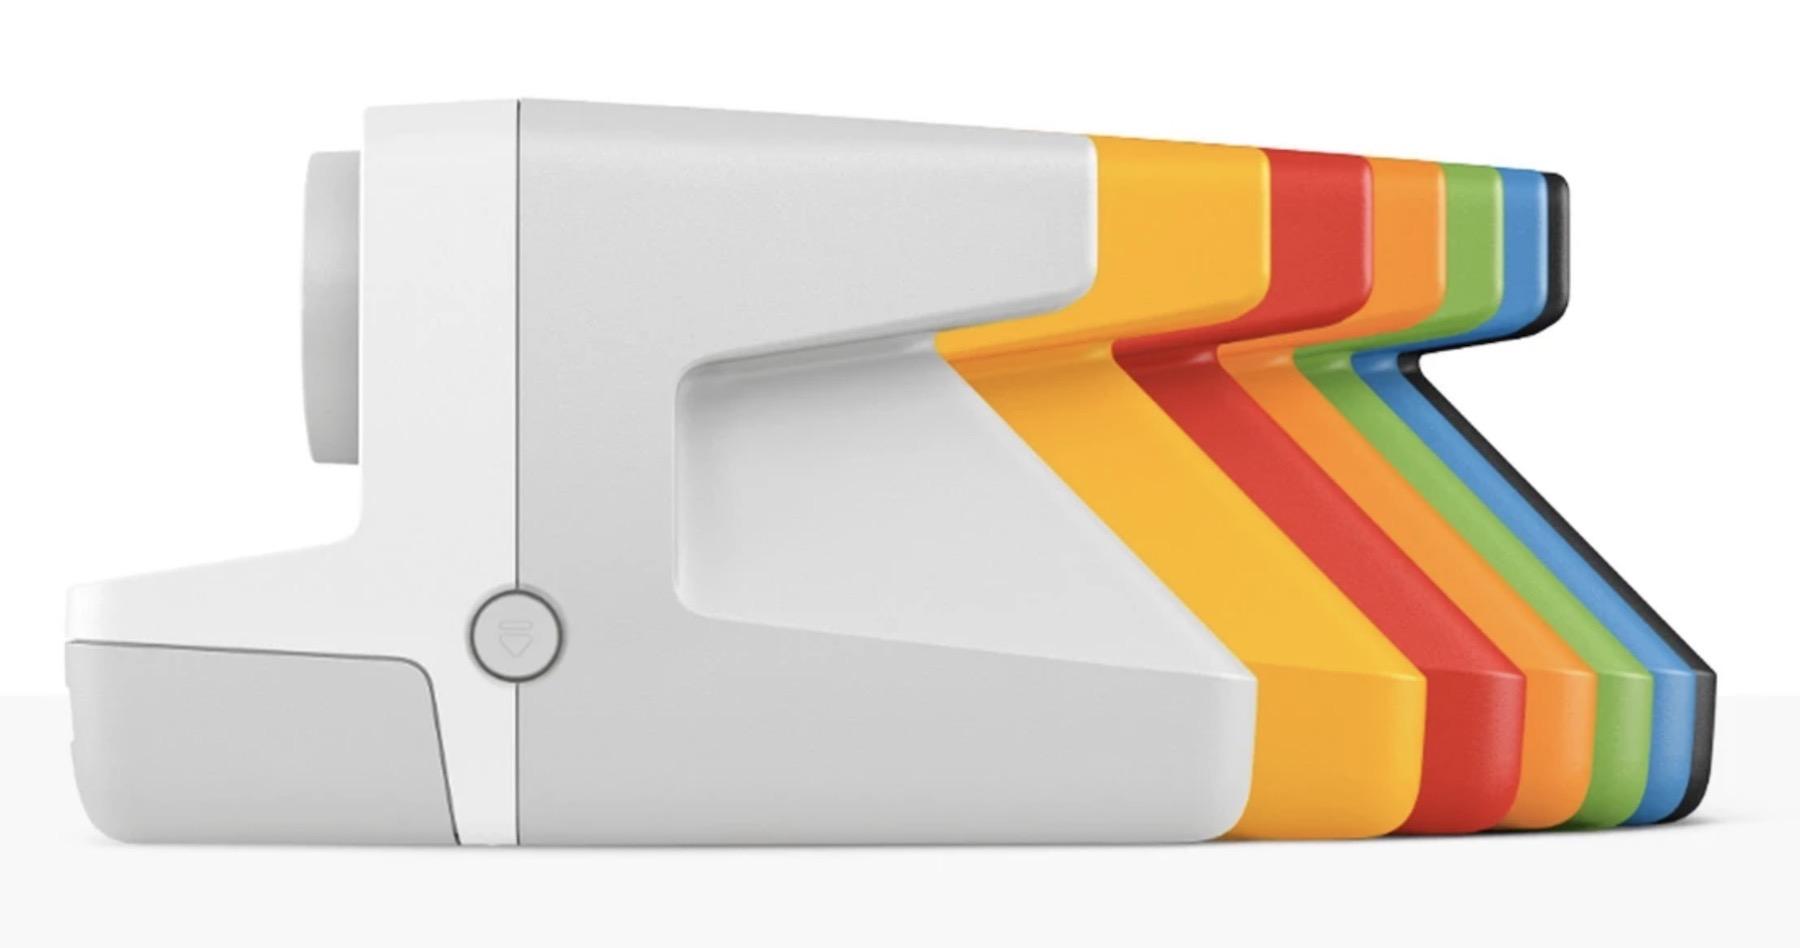 Polaroid Now カラーバリエーション